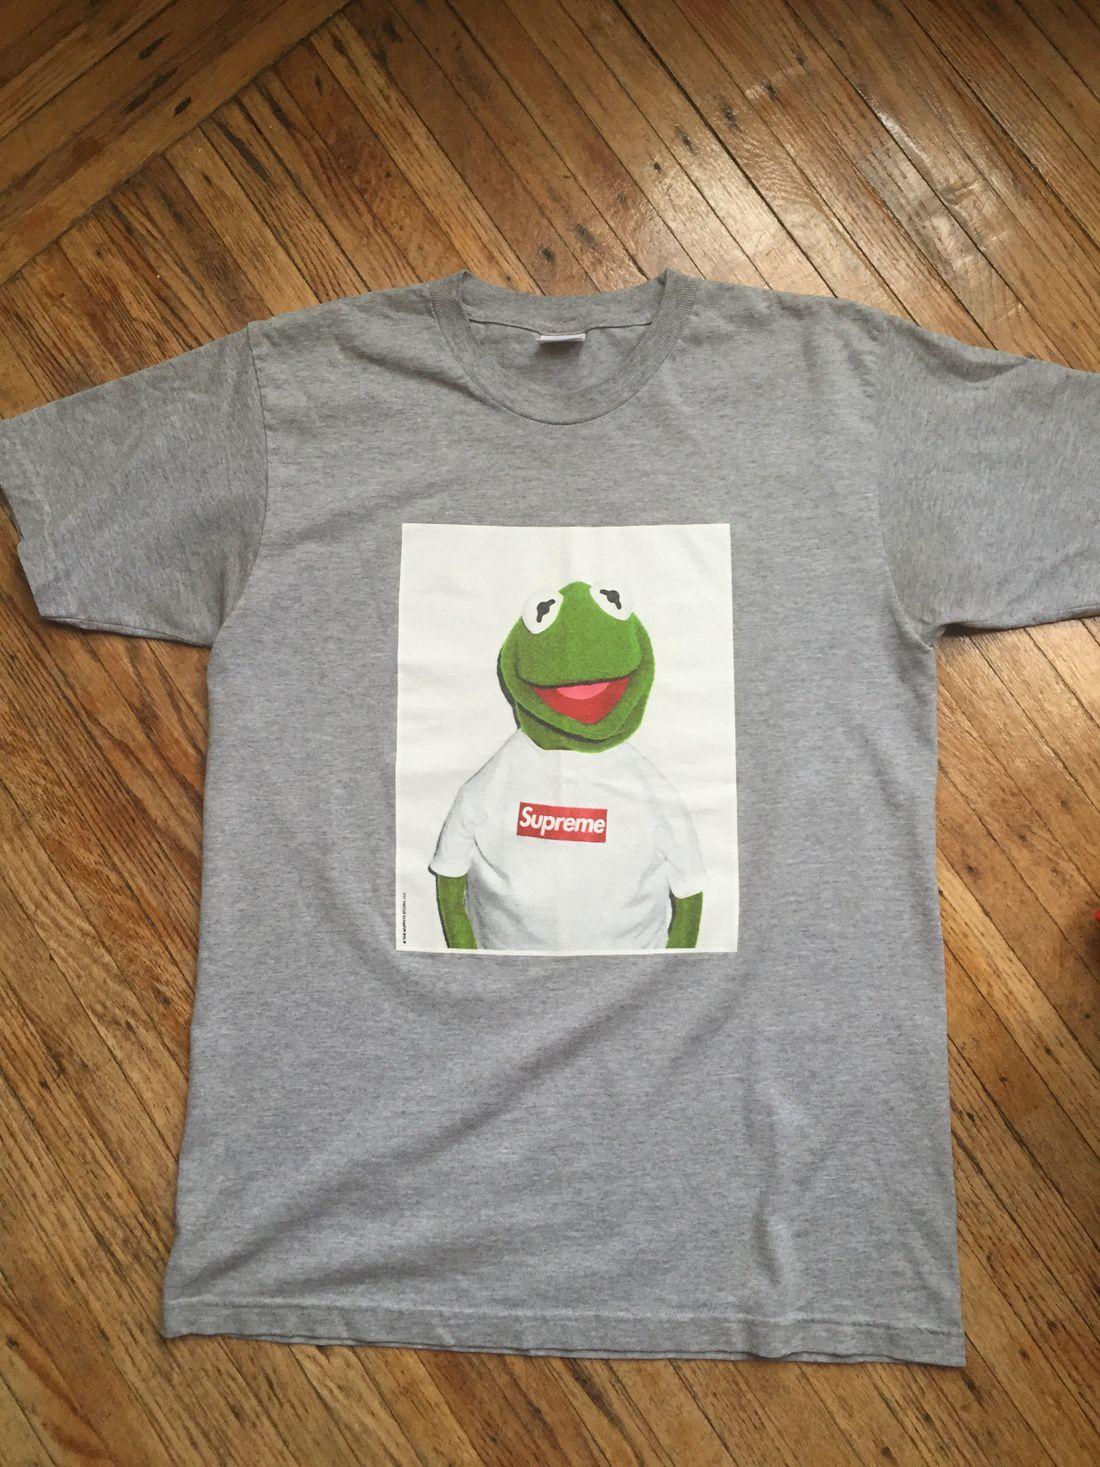 A T-shirt featuring Kermit the Frog wearing a Supreme box logo T-shirt